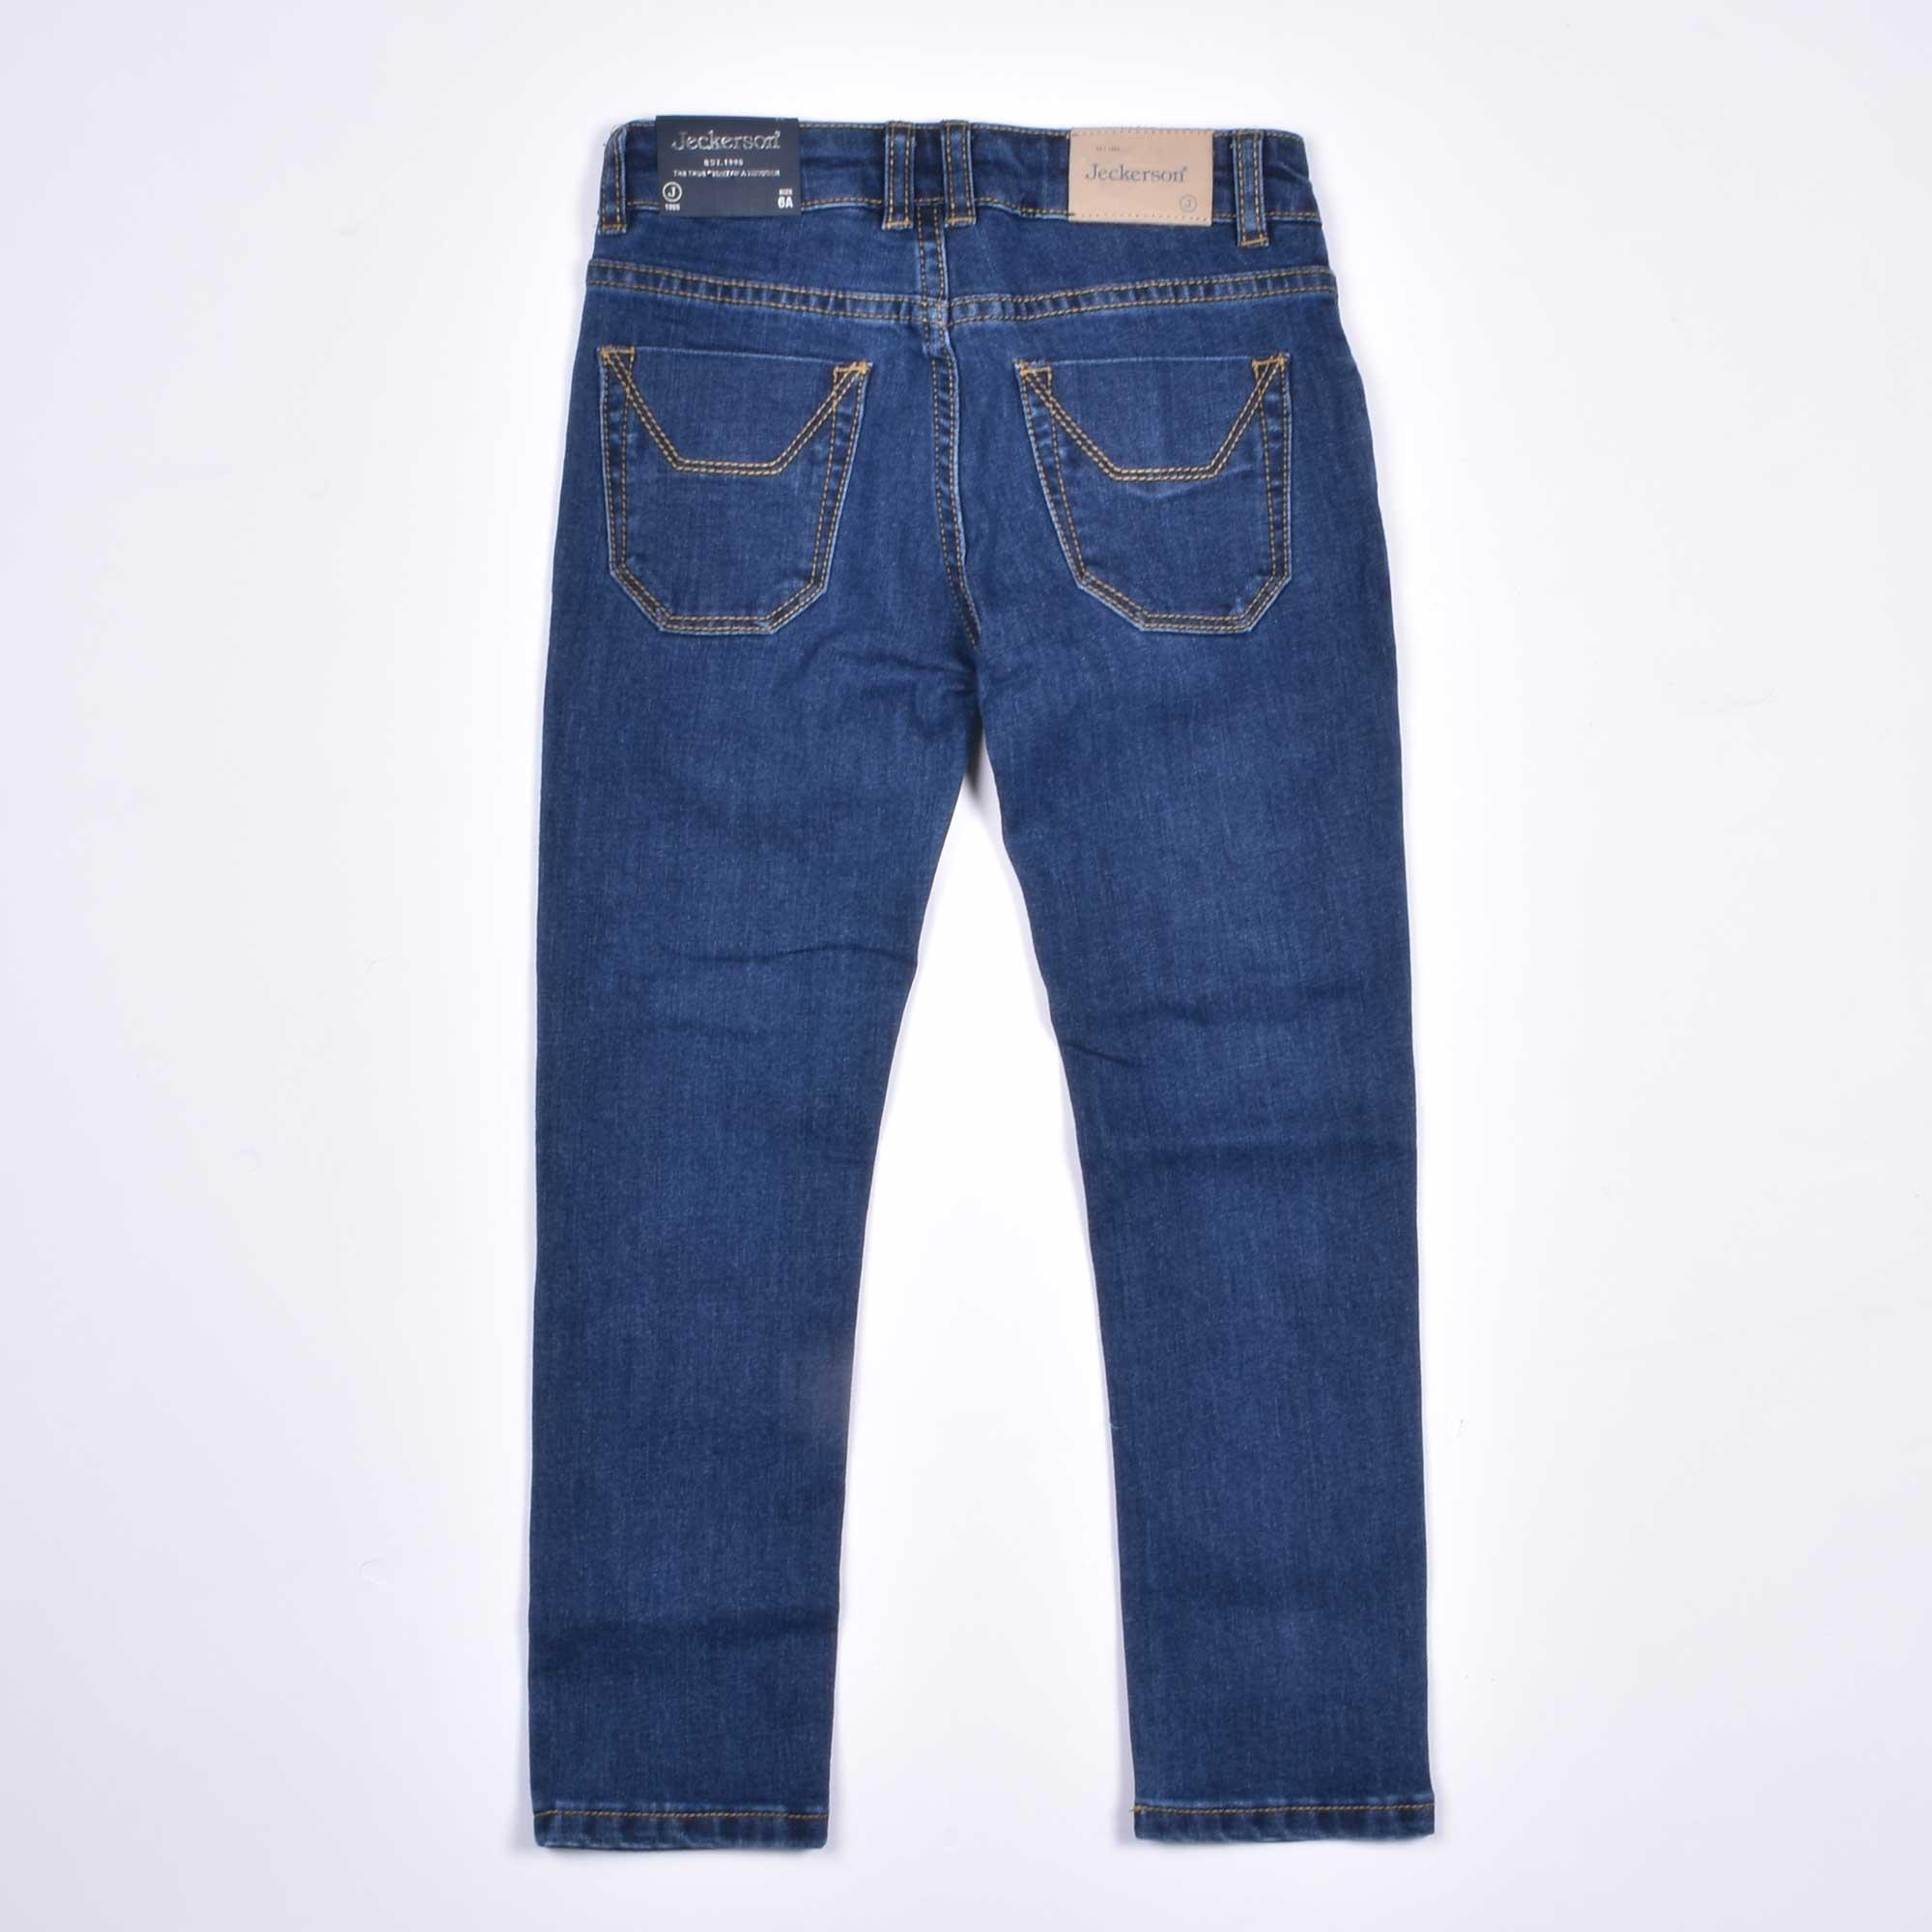 Jeans toppa alcantara blu  - Denim